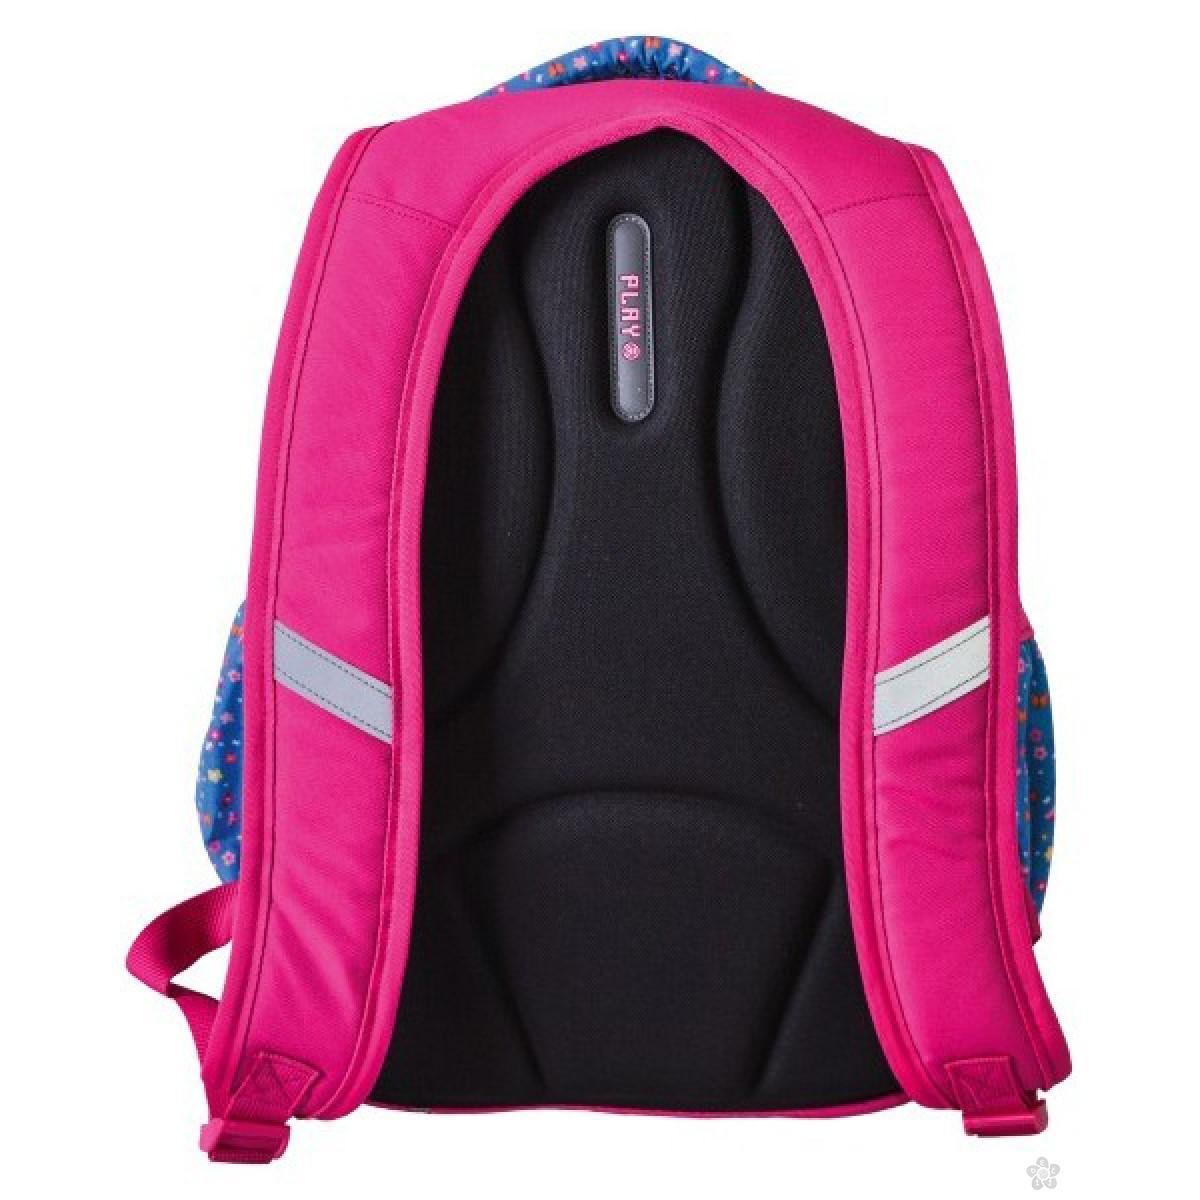 Ranac za školu Exa Sweet Pink, 160126